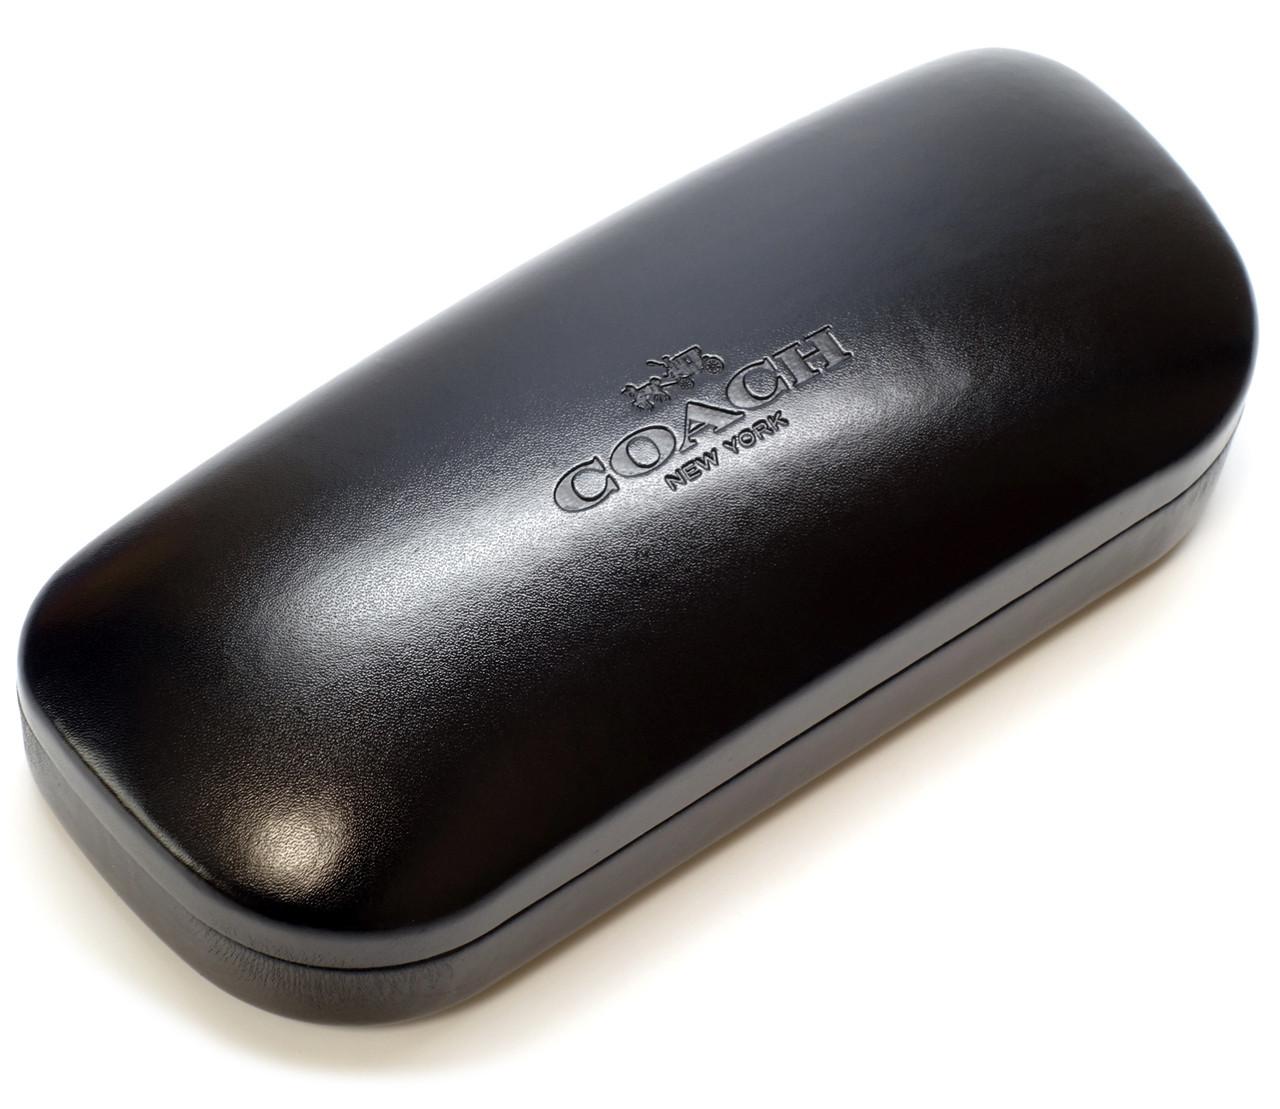 dc06541ef640 Coach Authentic Hard Eyeglass Case Medium Size in Black - Speert  International